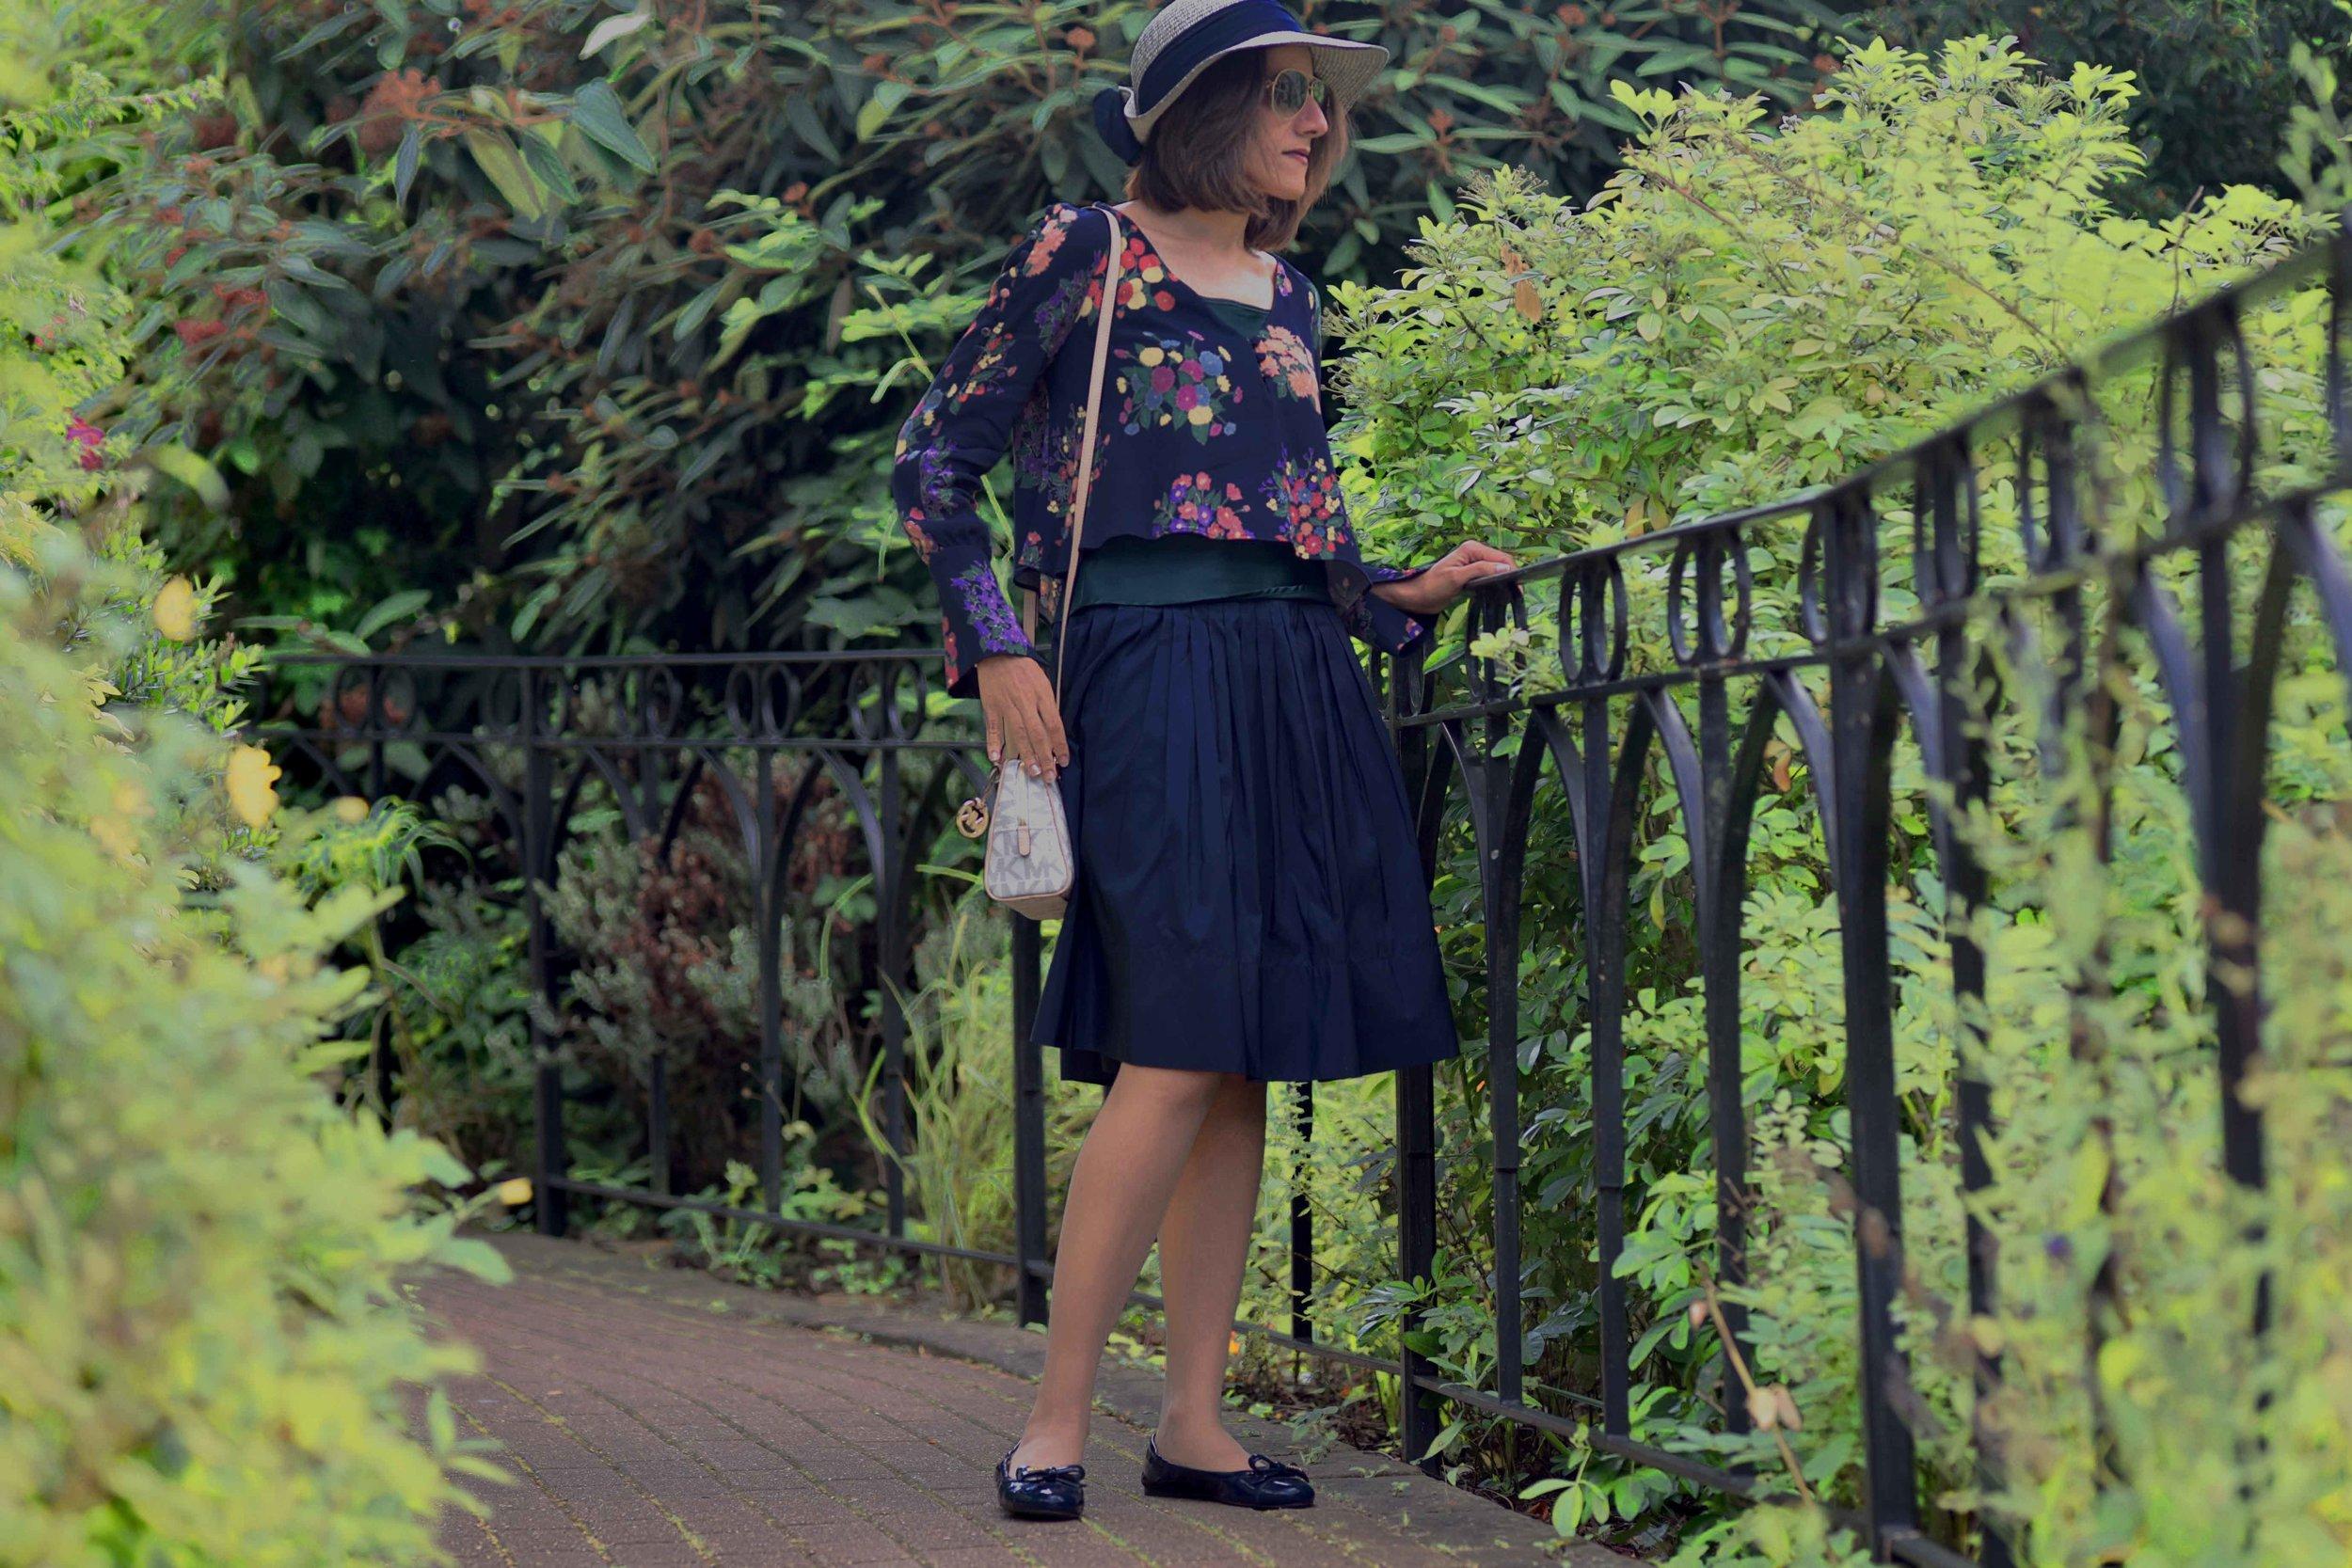 Zara floral top, Talbots silk Taffeta skirt, Talbots silk camisole, Michael Kors bag, Prada ballet flats, M&S hat. Image©sourcingstyle.com